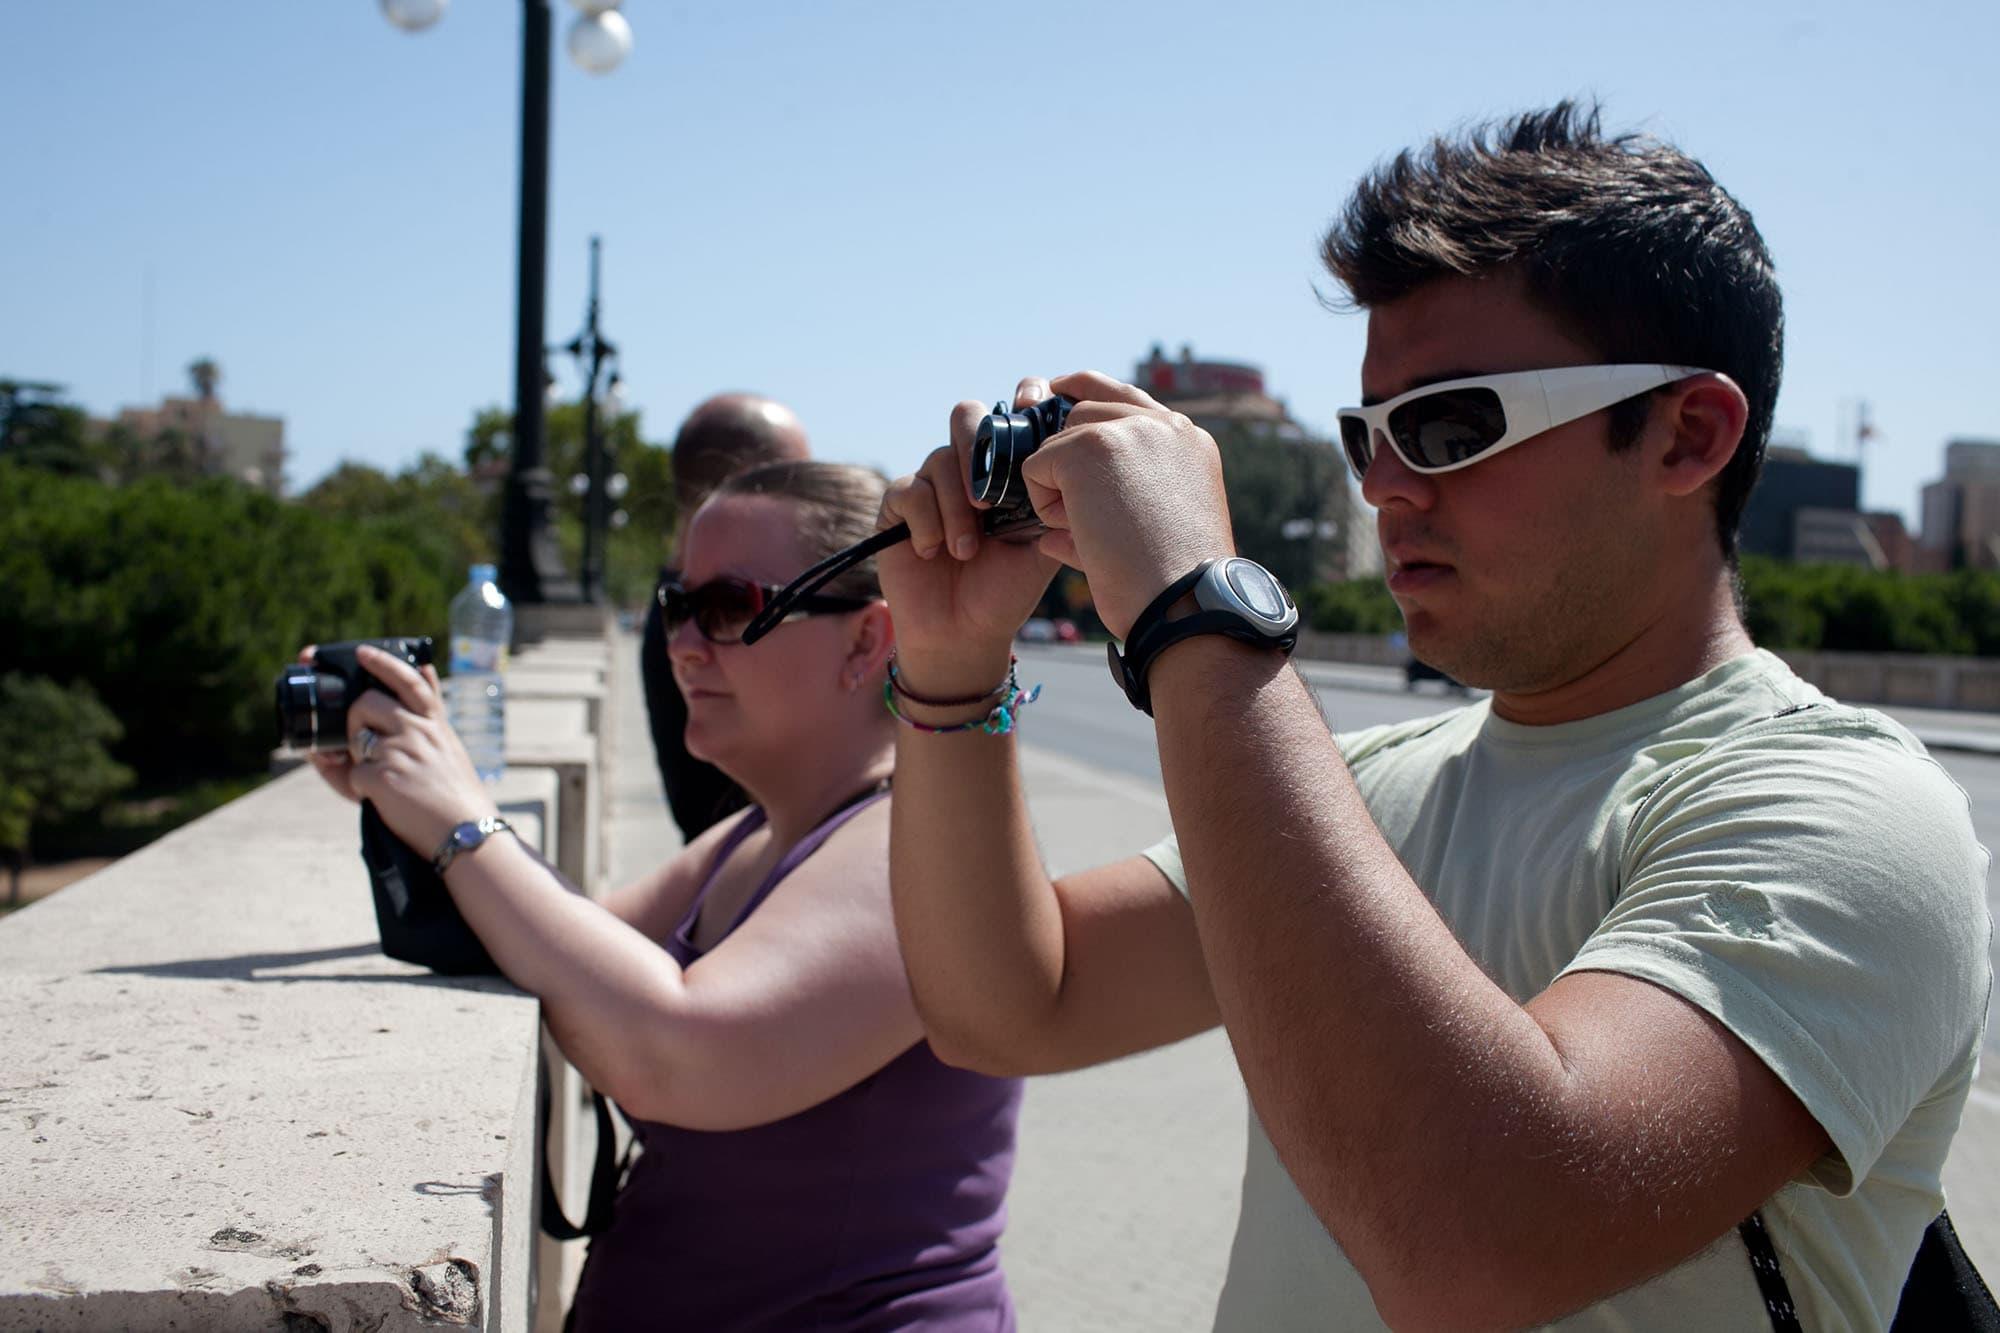 Jaime and Ali taking photos.